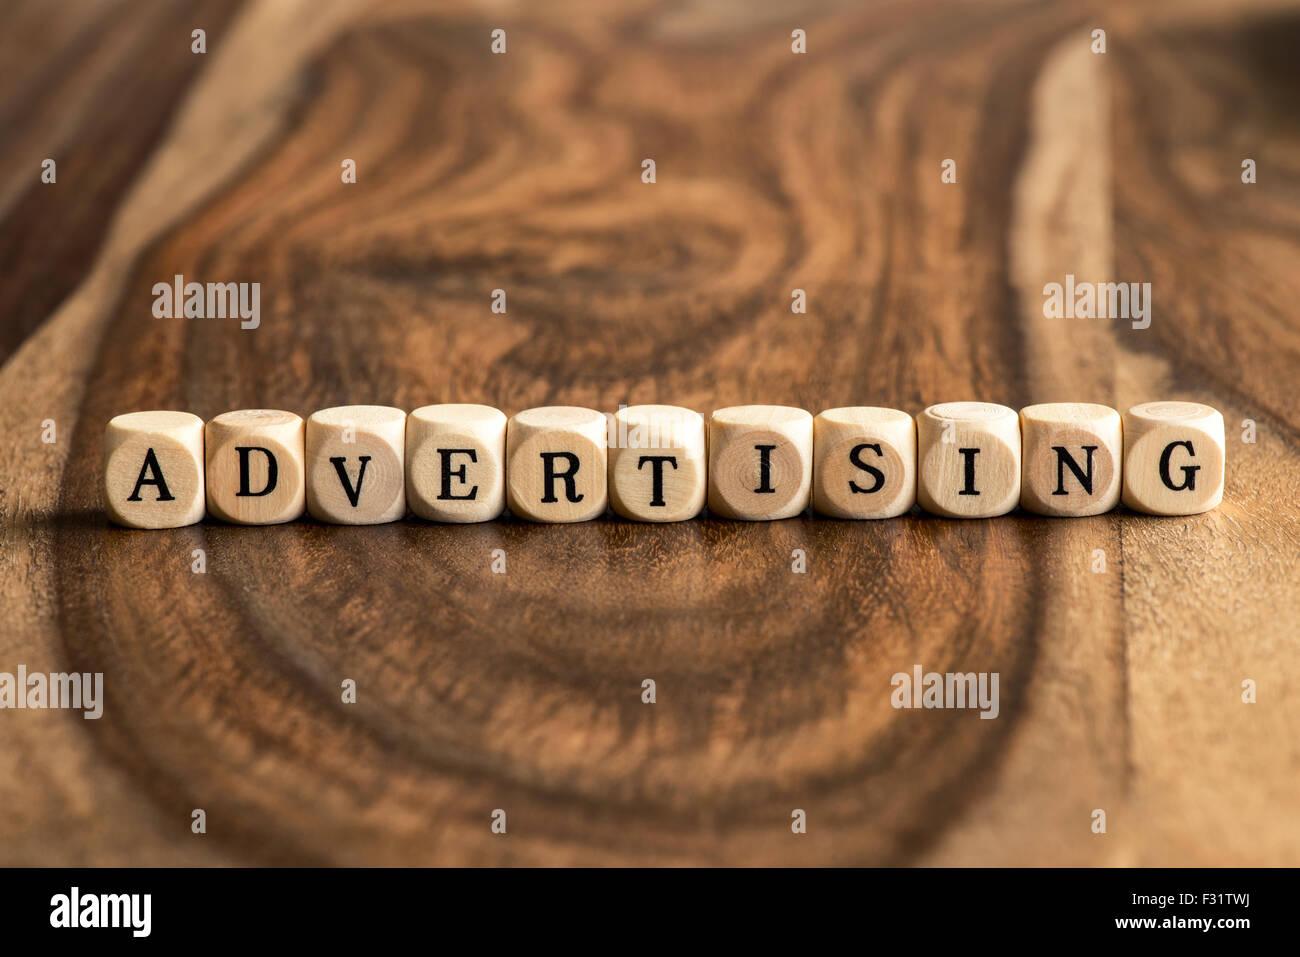 ADVERTISING word background on wood blocks - Stock Image